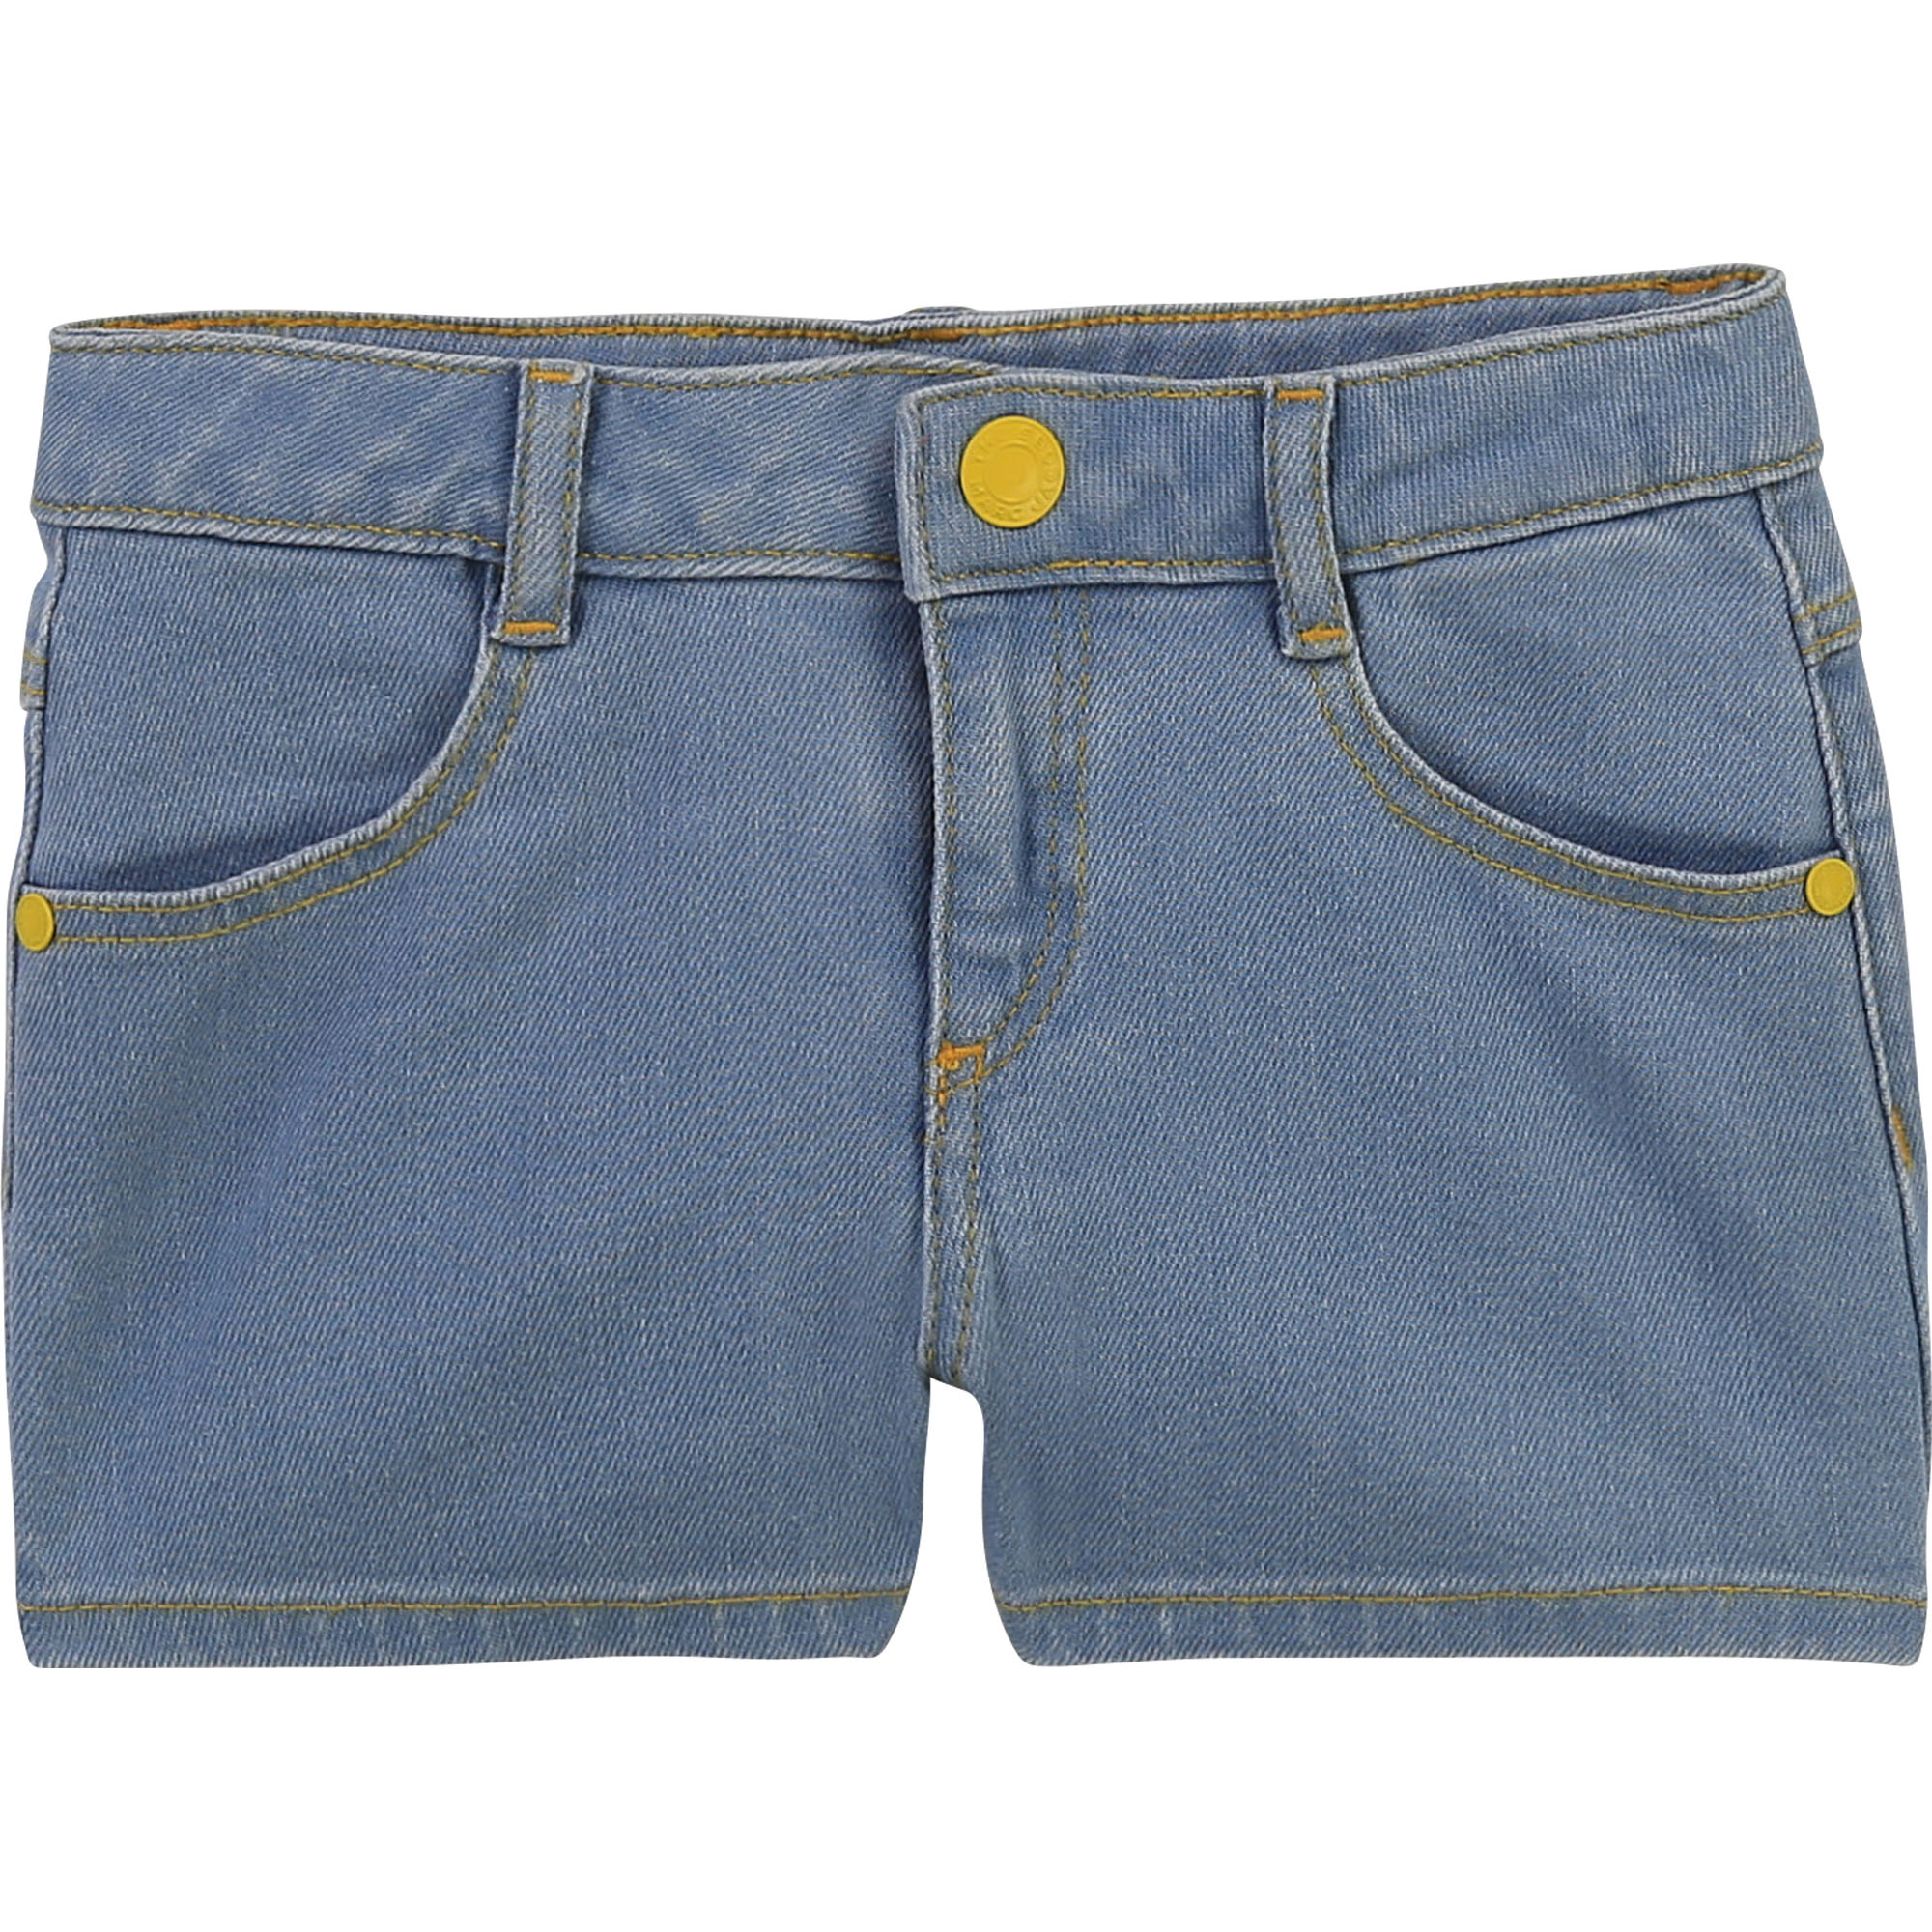 Denim shorts THE MARC JACOBS for GIRL